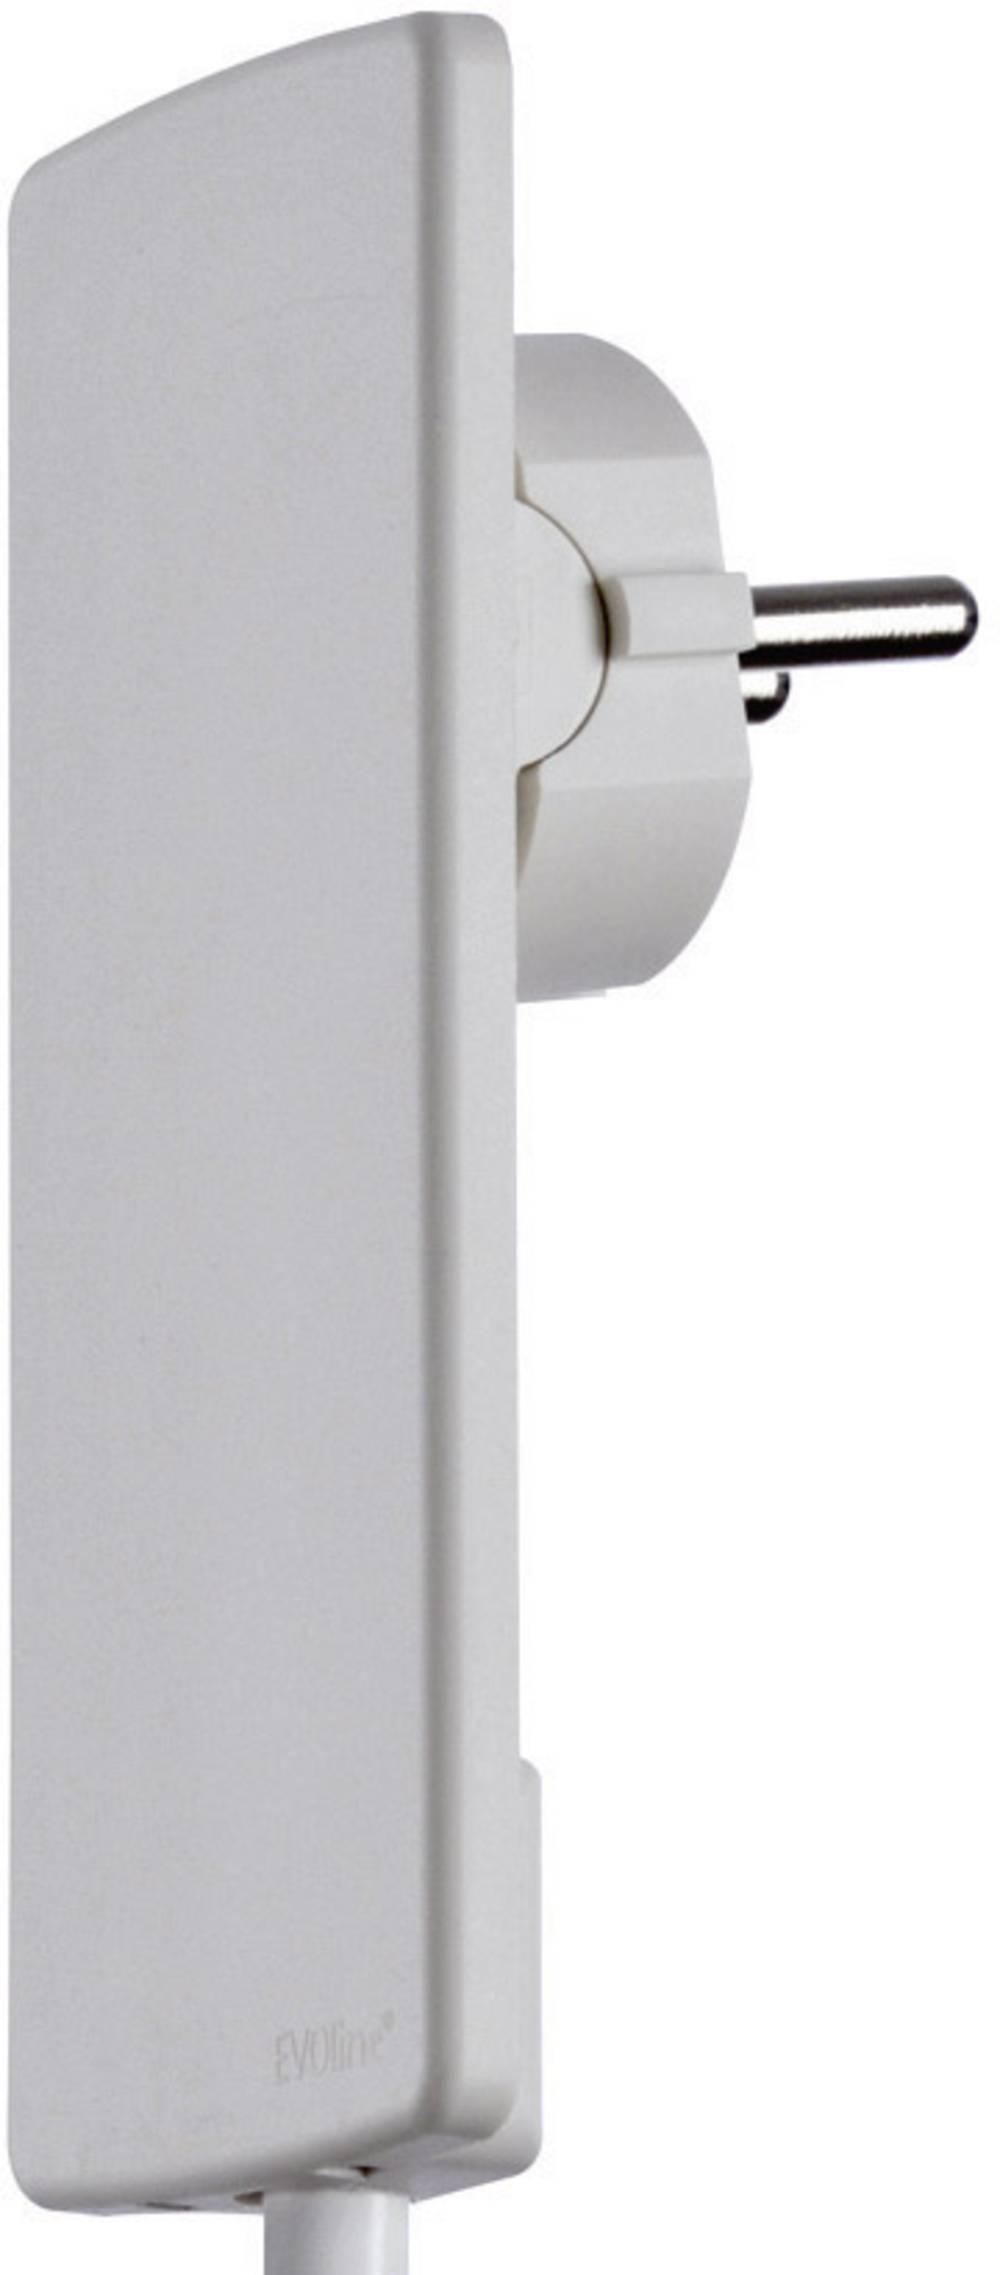 Fladstik EVOline® Plug hvid EVOline EVOline Plug 103220 Hvid